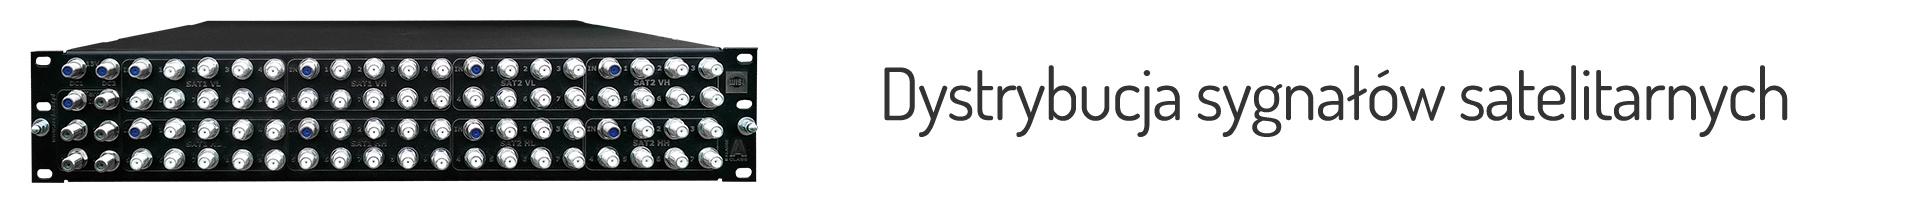 SLIDER_Dystrybucja_sygnalow_satelitarnych_e